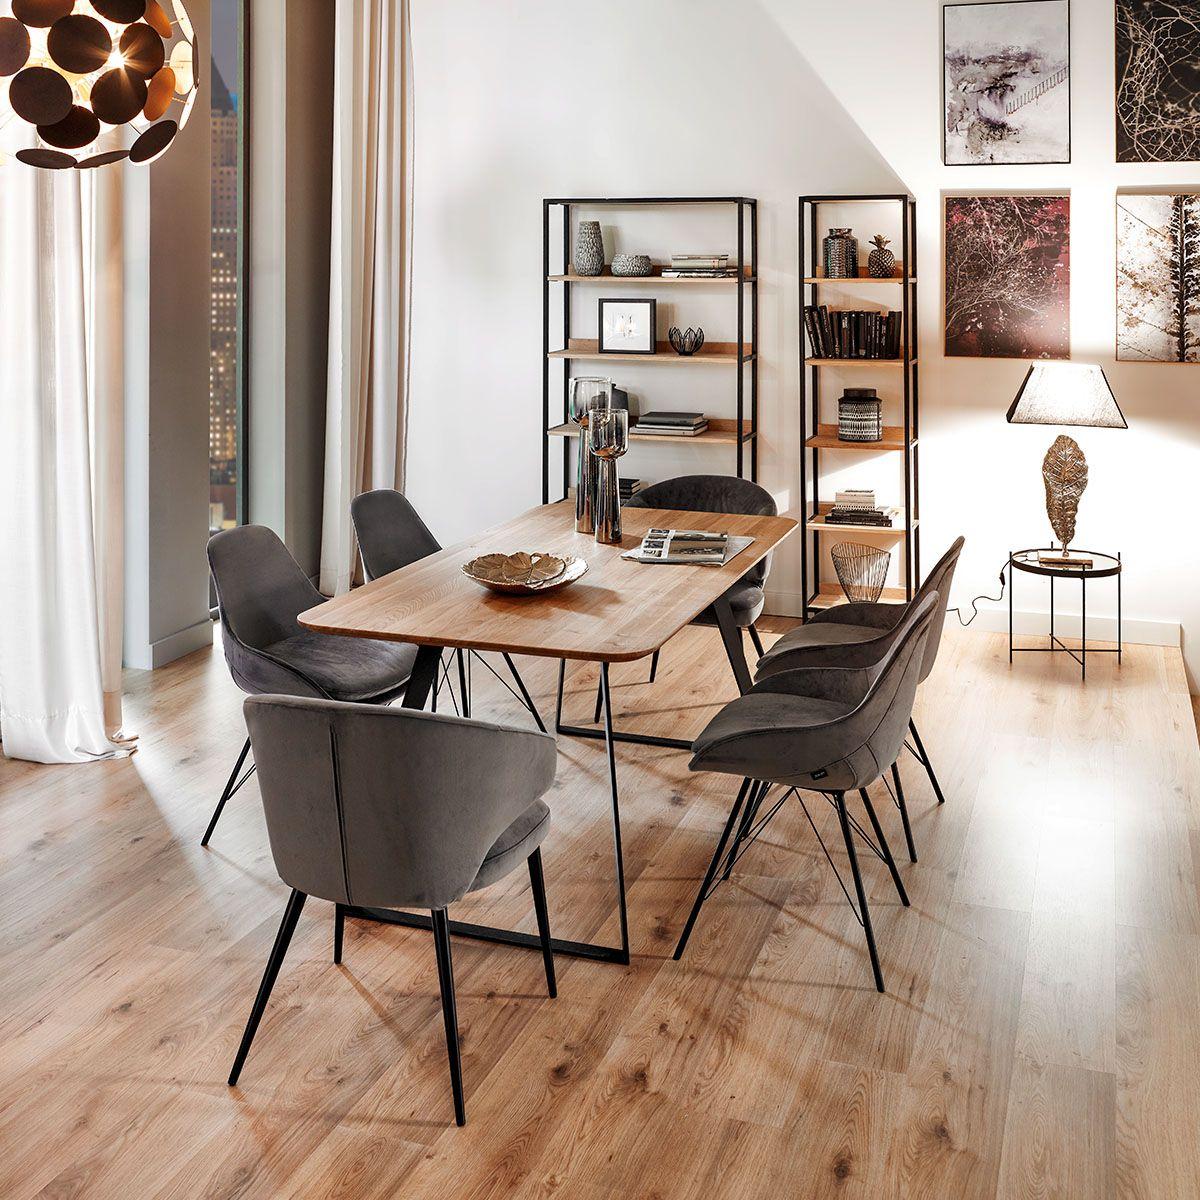 Stuhl In Textil Graphitfarben Schwarz In 2020 Stuhle